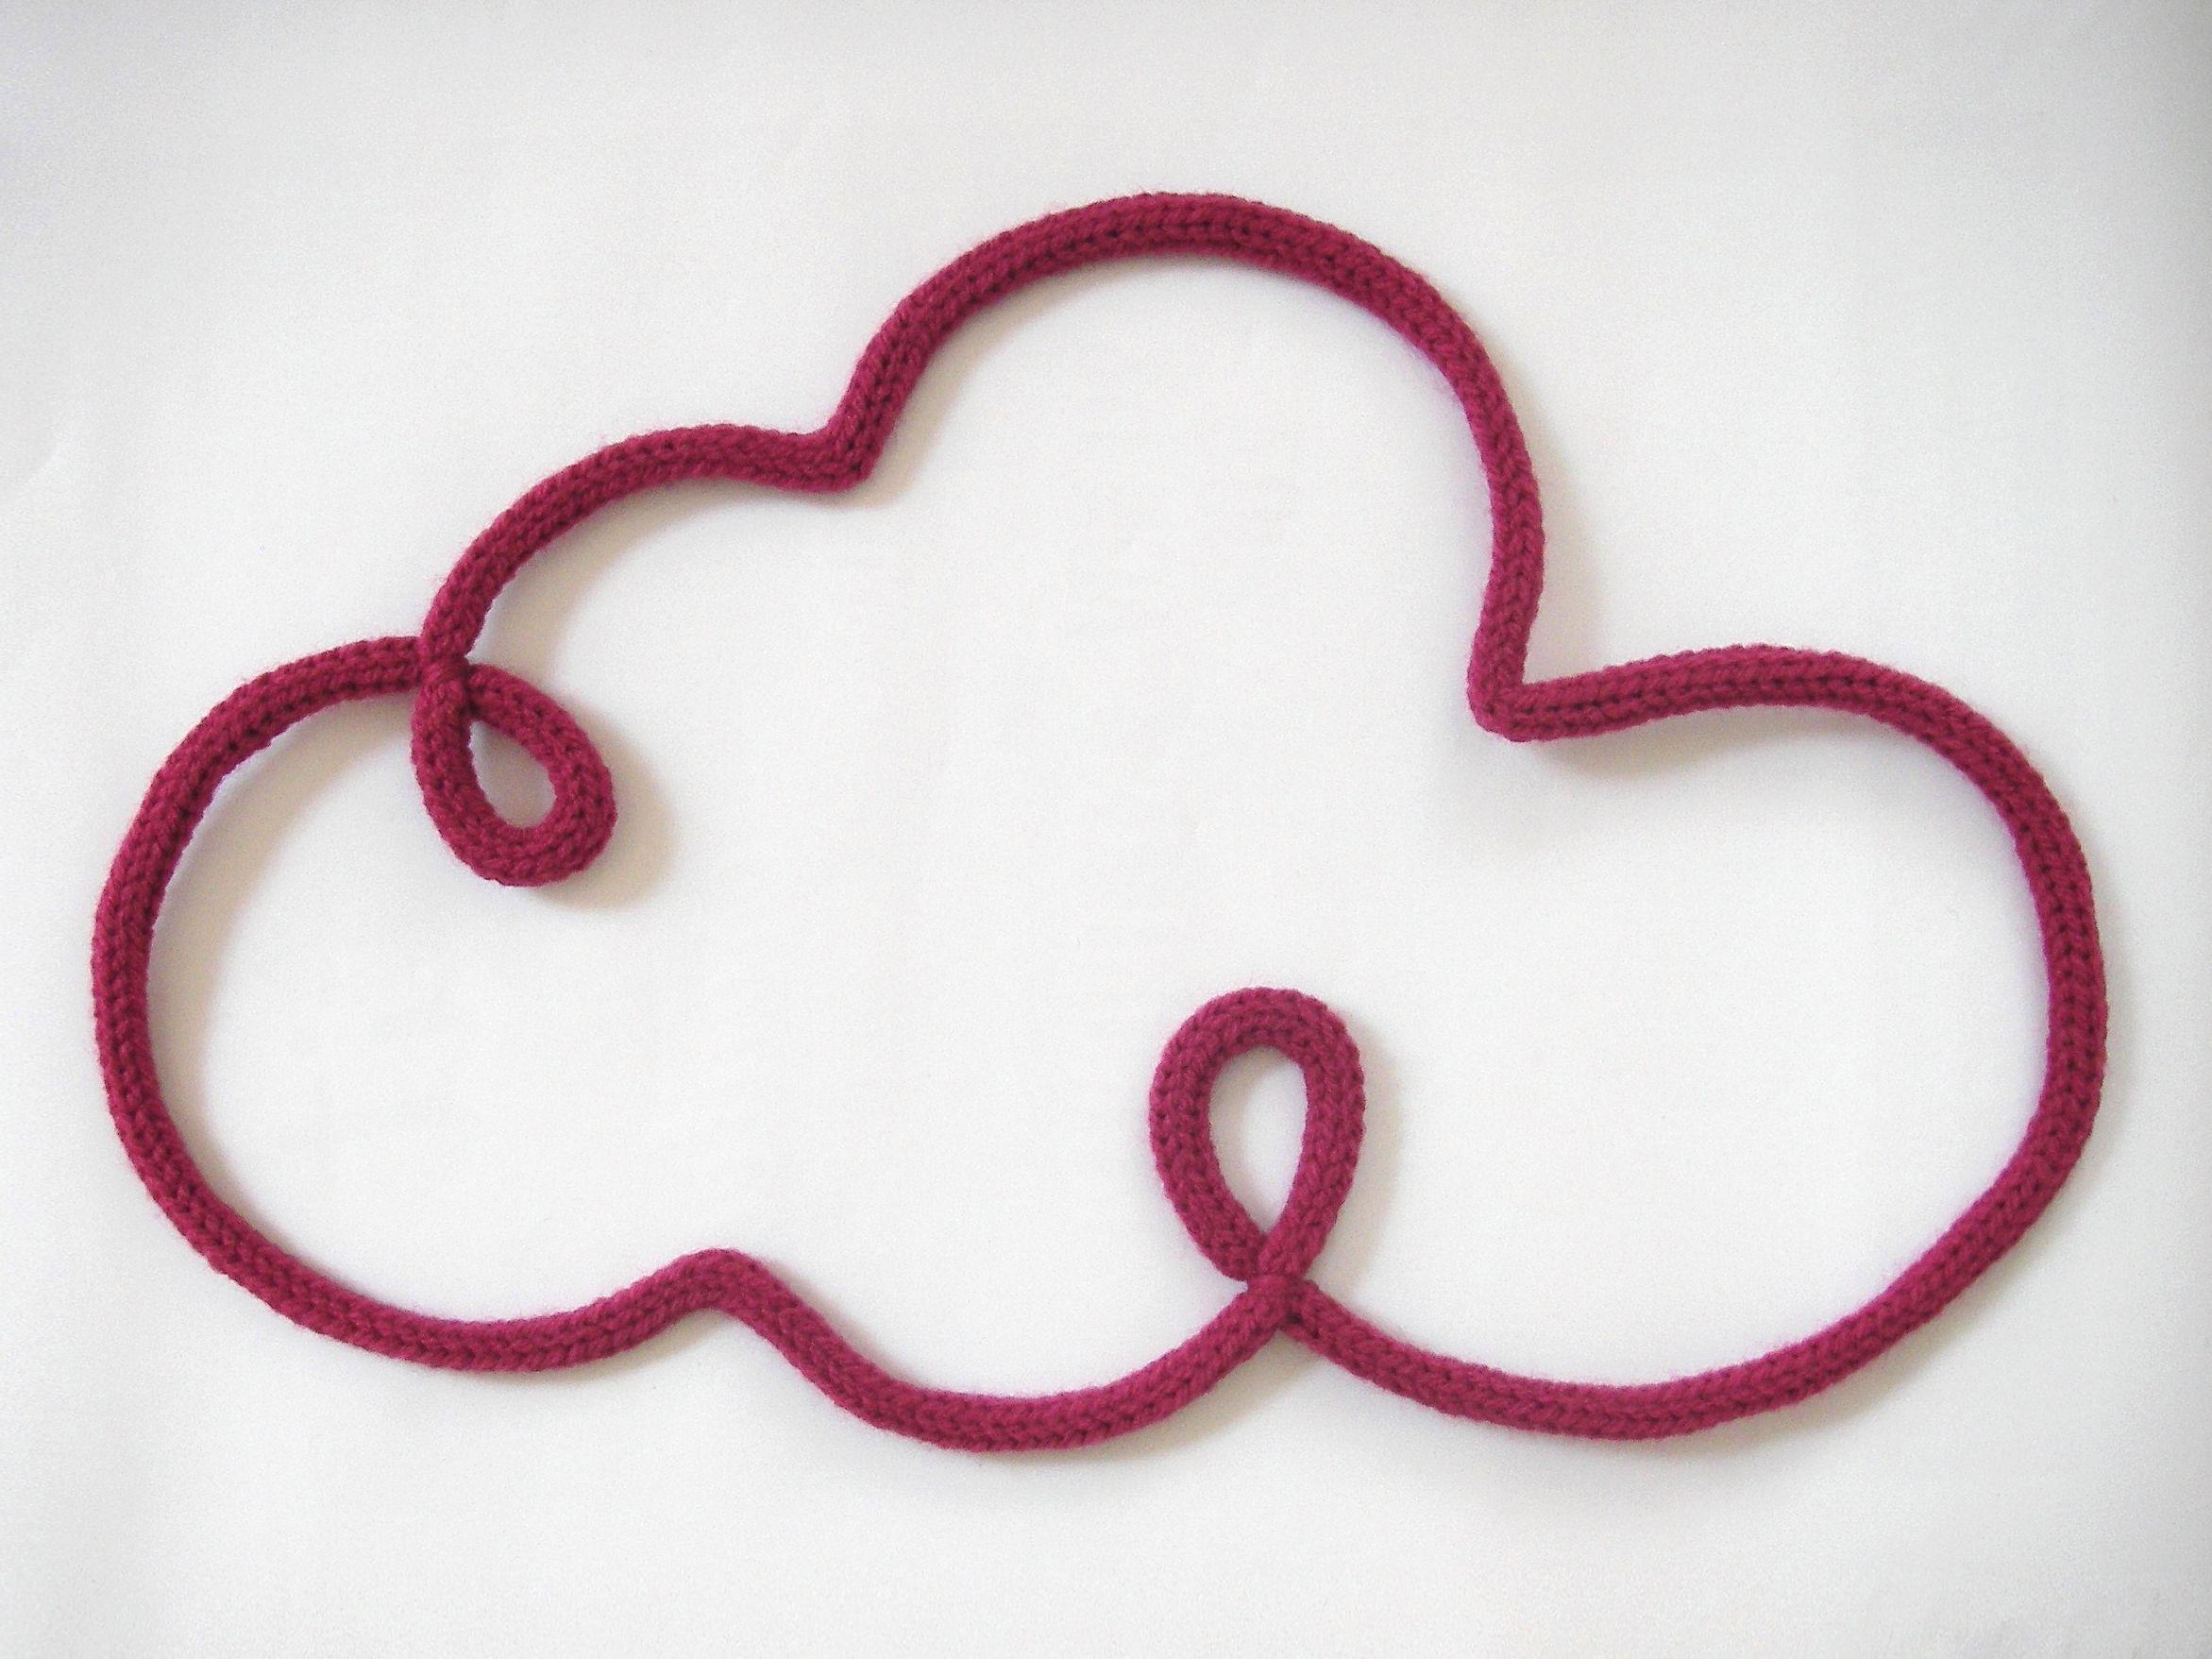 Poisson en laine | i-cord | Pinterest | Ganchillo, Costura y Bebe